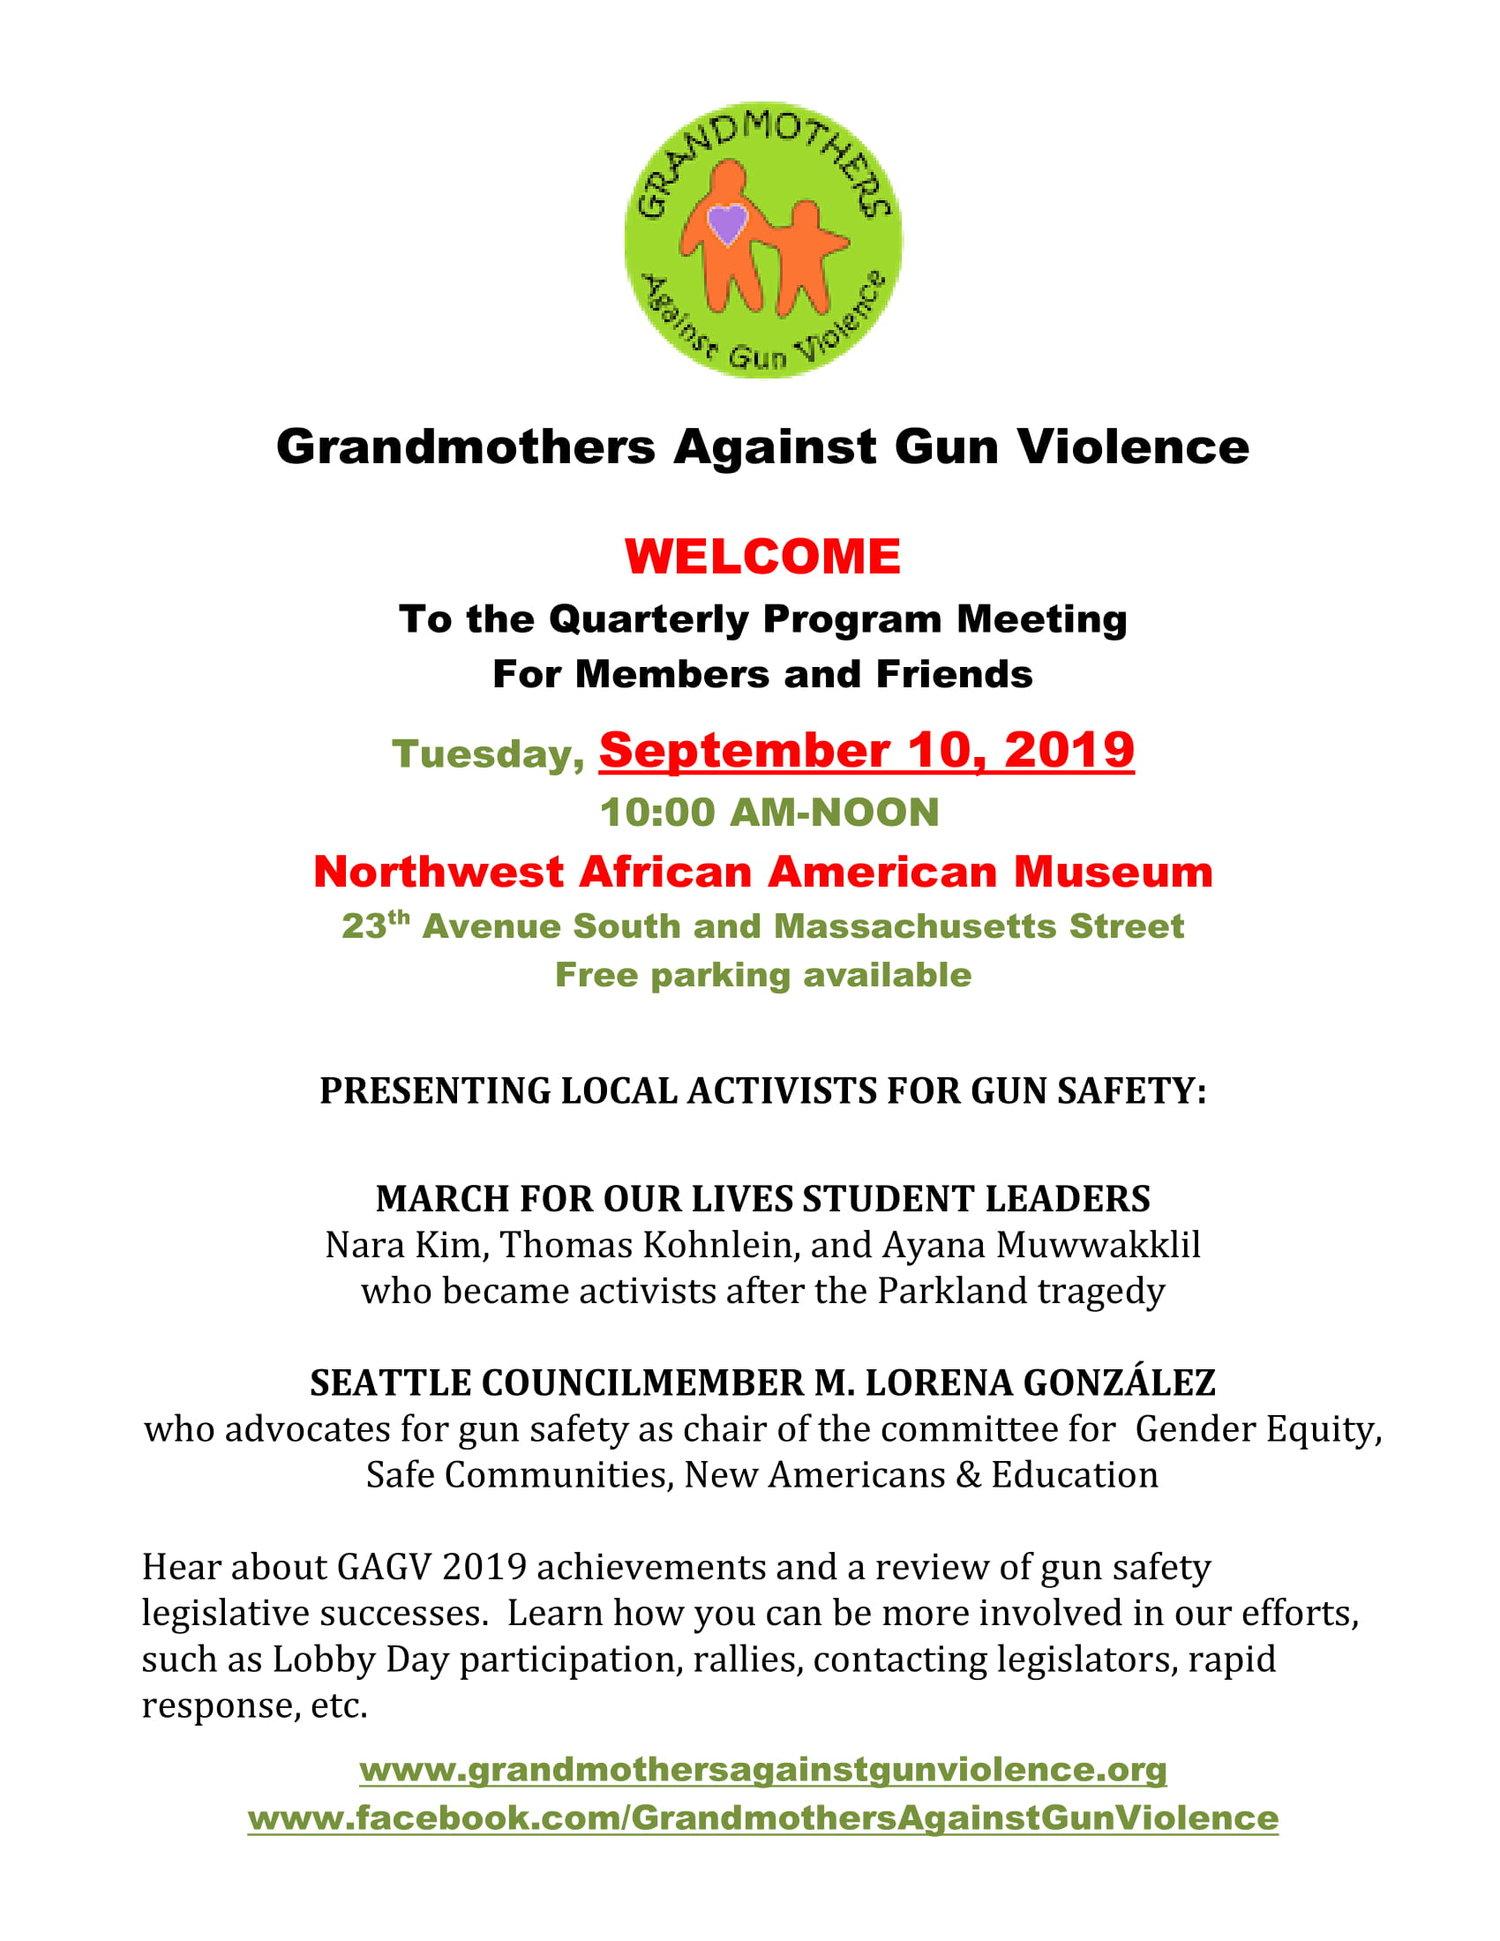 Quarterly Program Meeting — Grandmothers Against Gun Violence